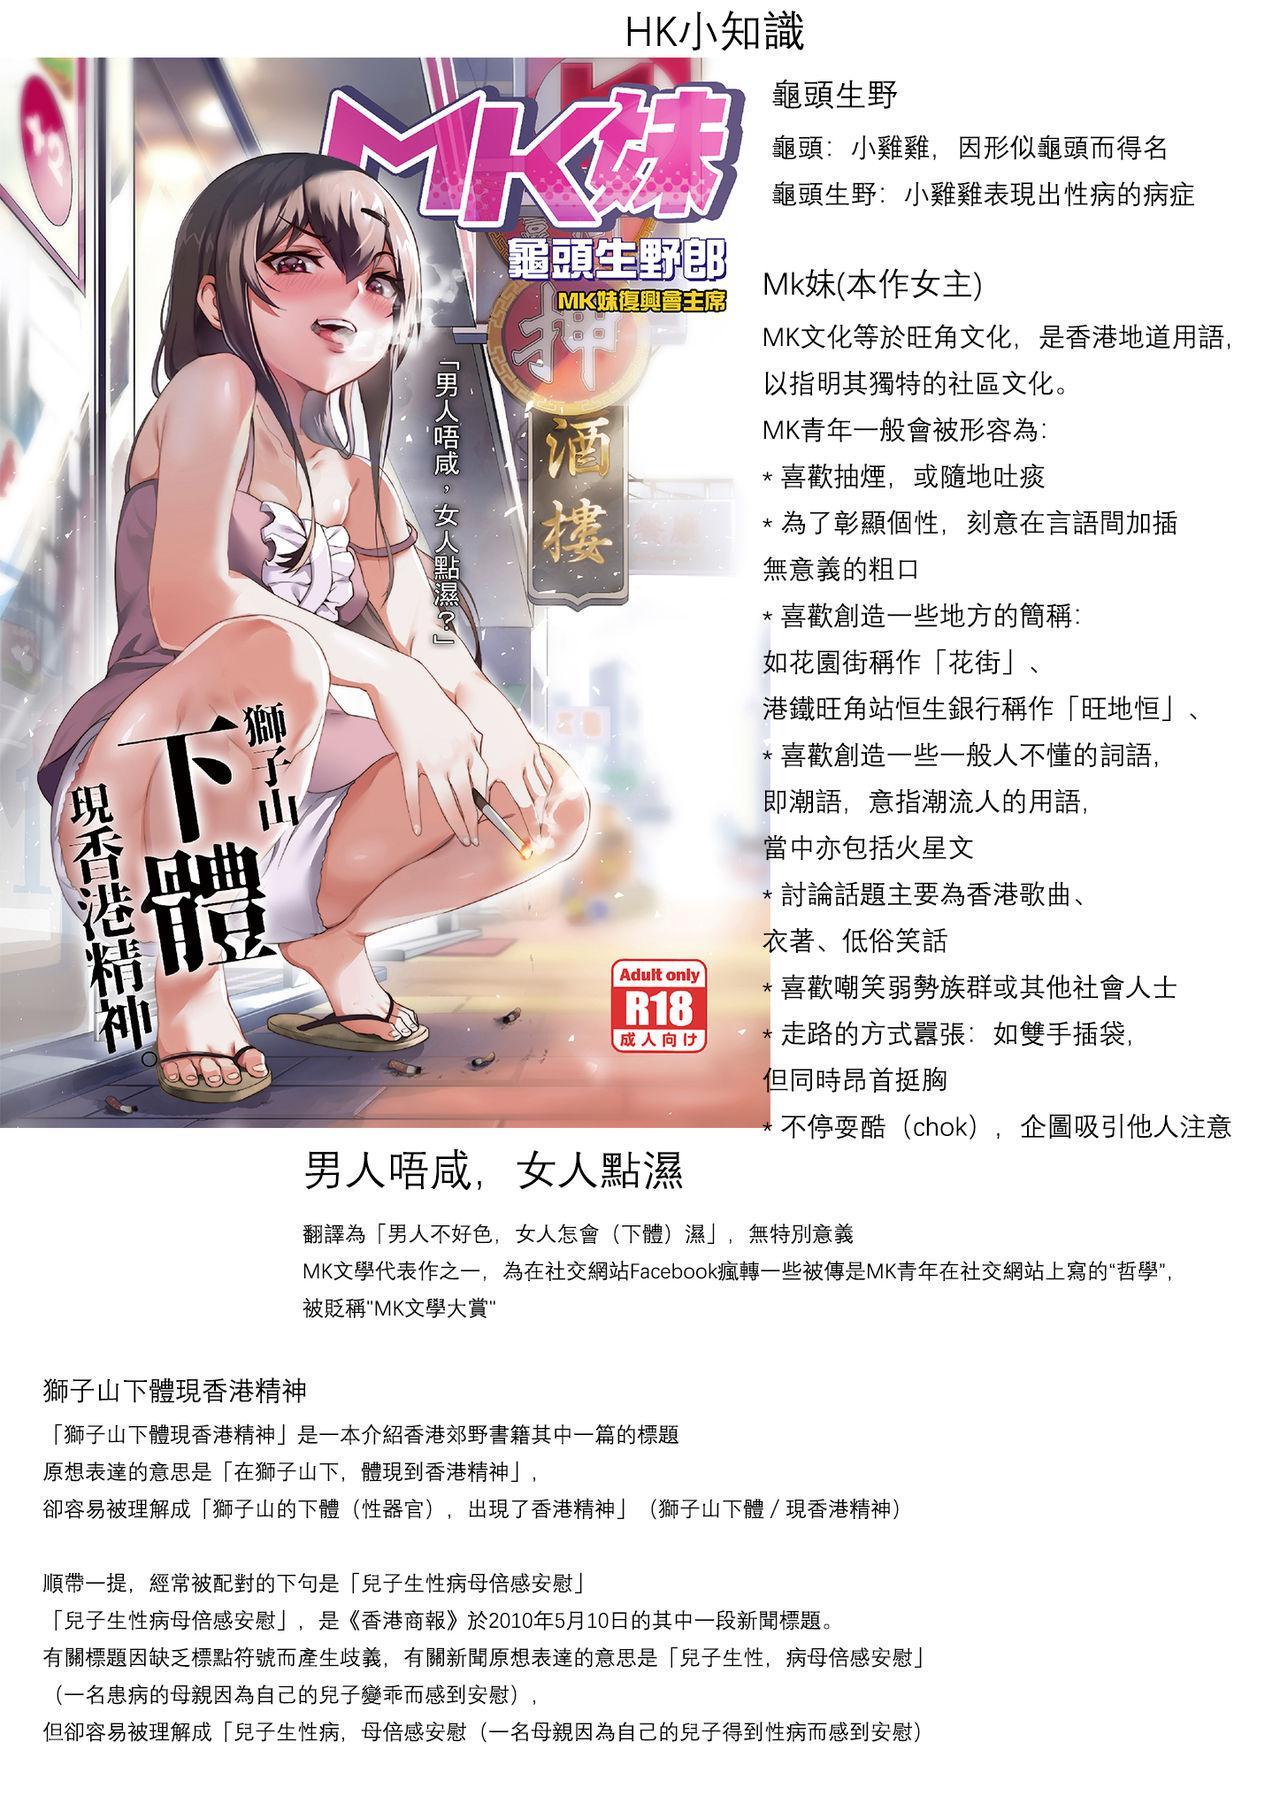 [Gantou Ikunoro] MK girl embodies the spirit of Hong Kong under the Lion Rock [Chinese]  [君廣東話本當上手機翻漢化組] v2 2